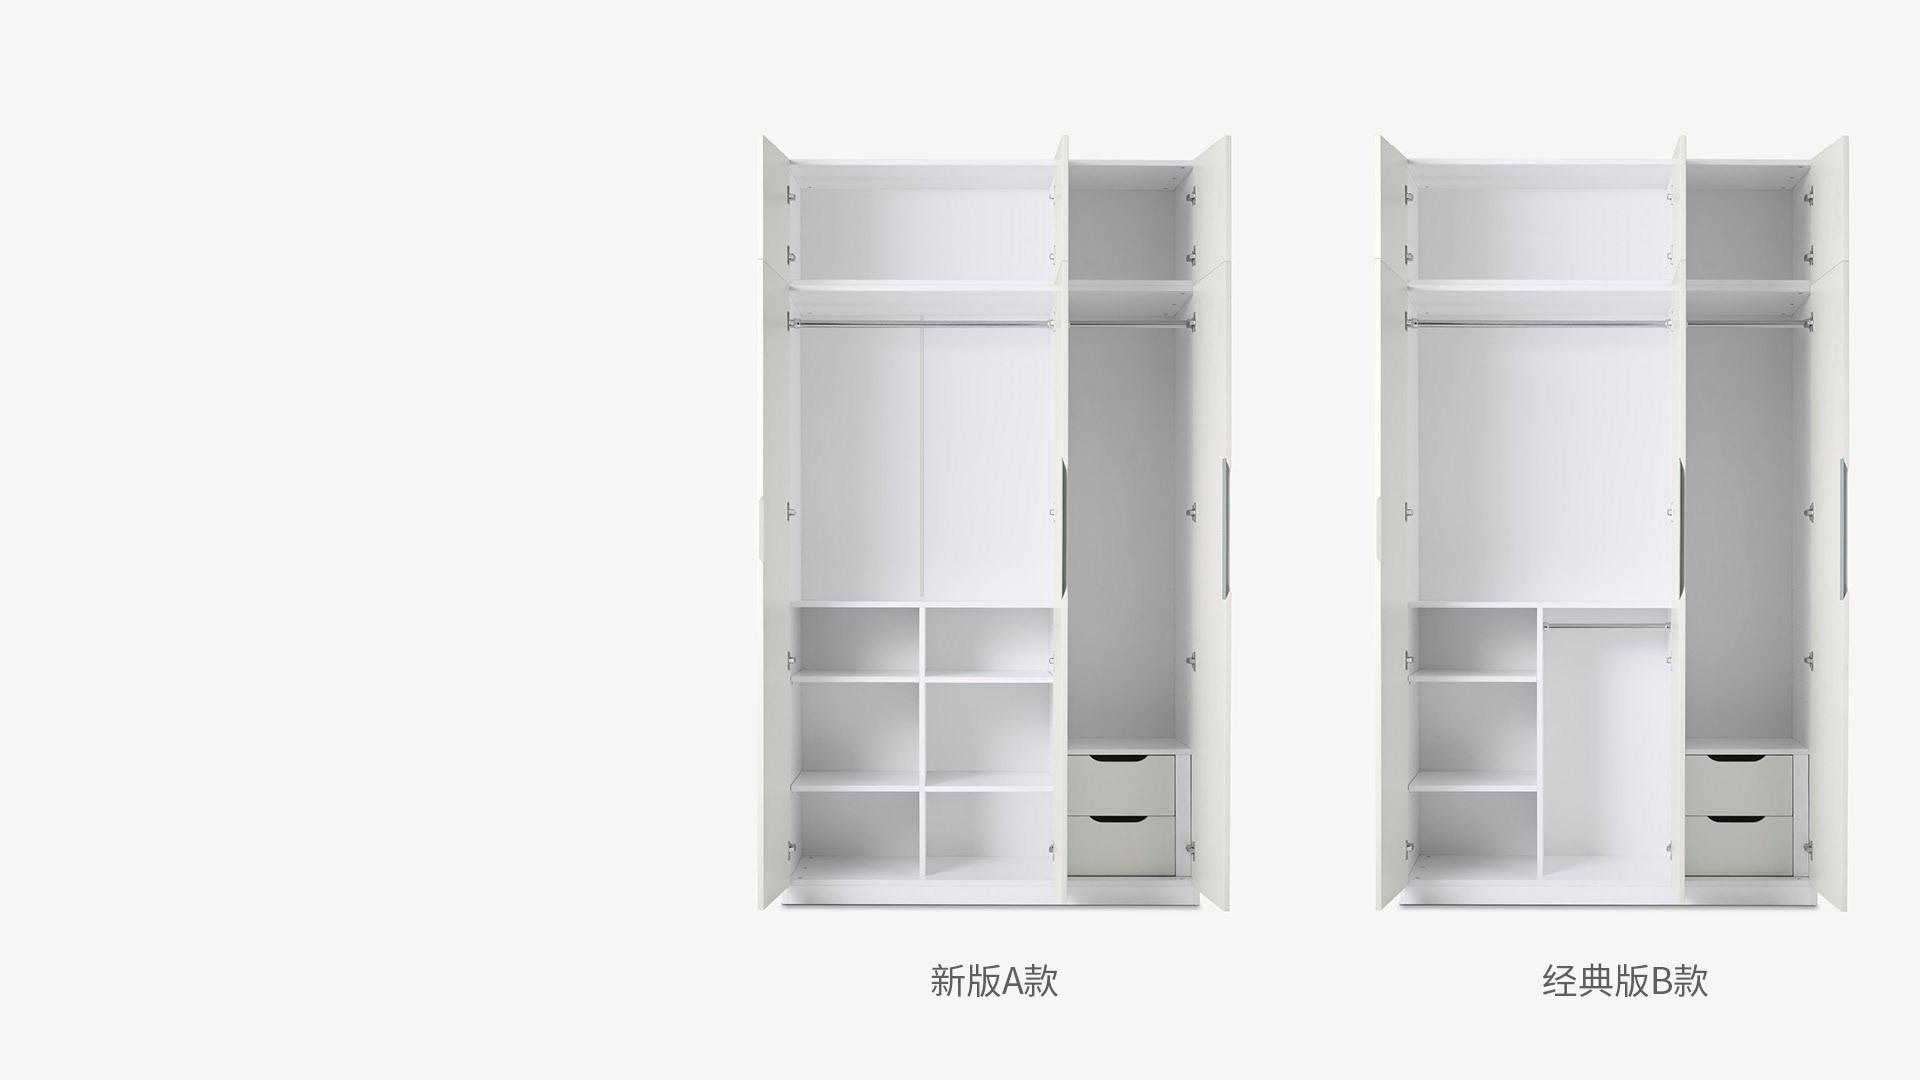 A/B两款空间布局<br/>新版/经典版两种选择